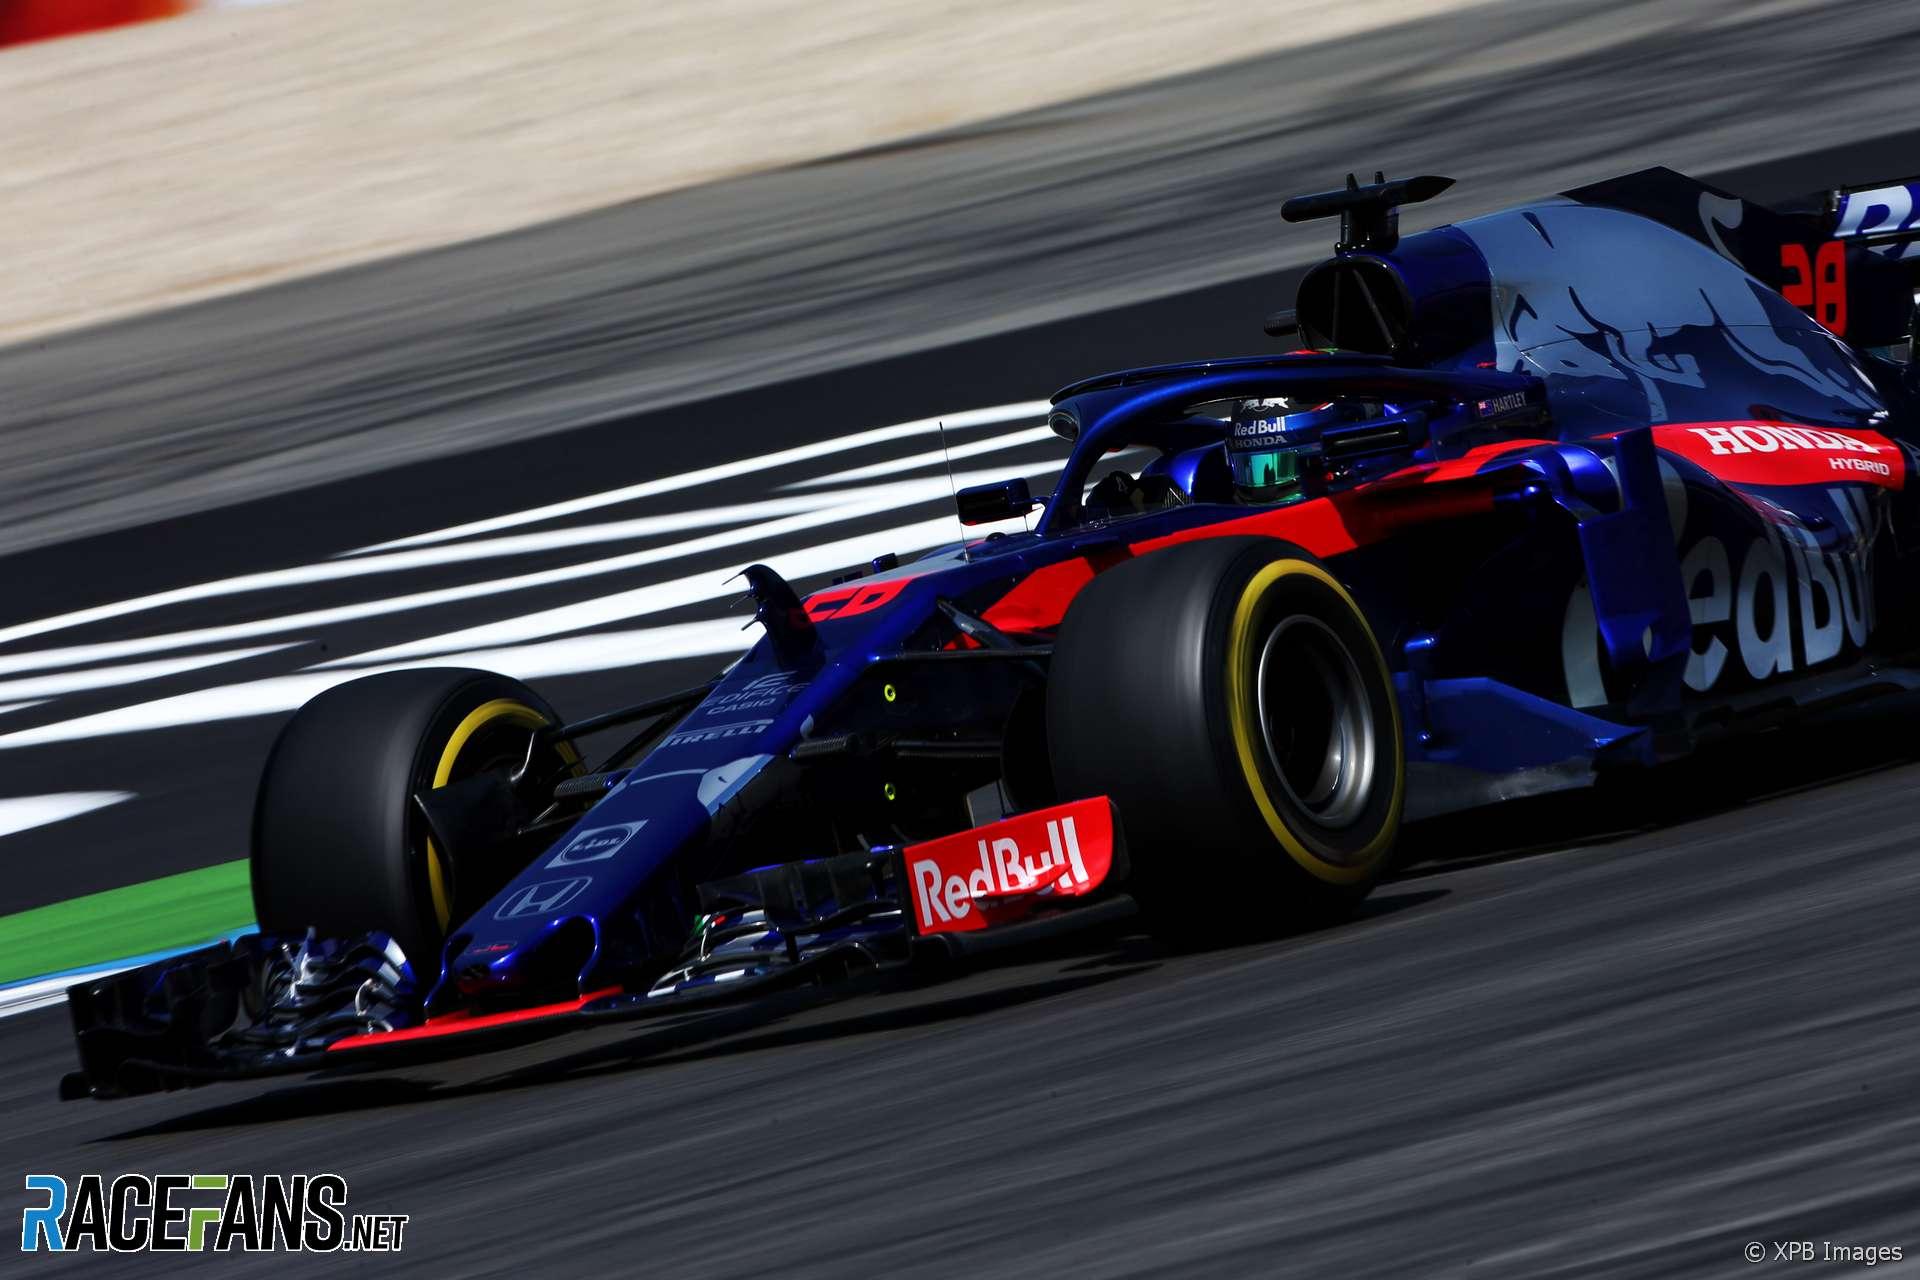 Pierre Gasly, Toro Rosso, Hockenheimring, 2018